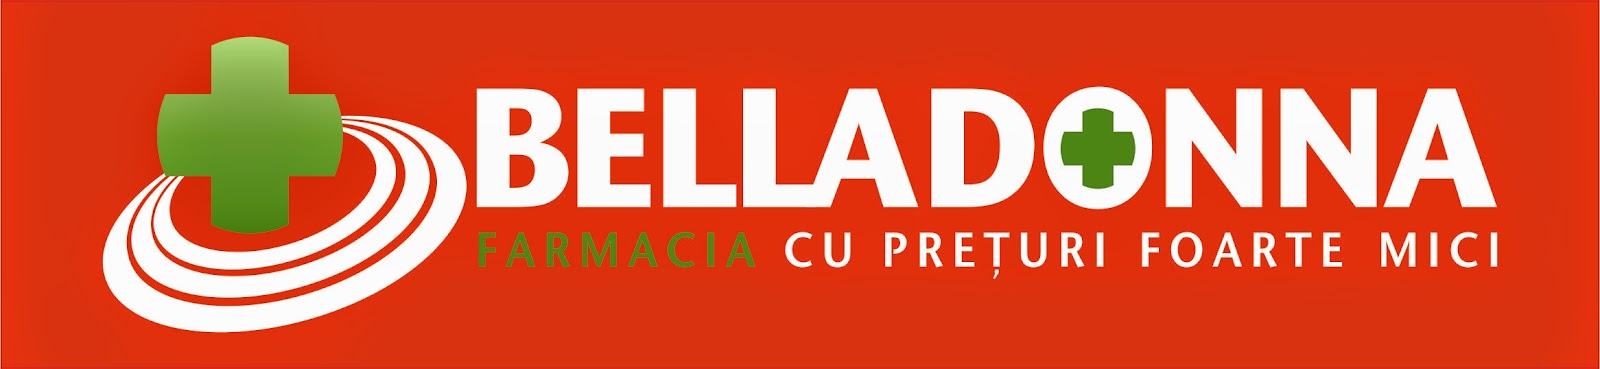 Belladonna -sigla rosu